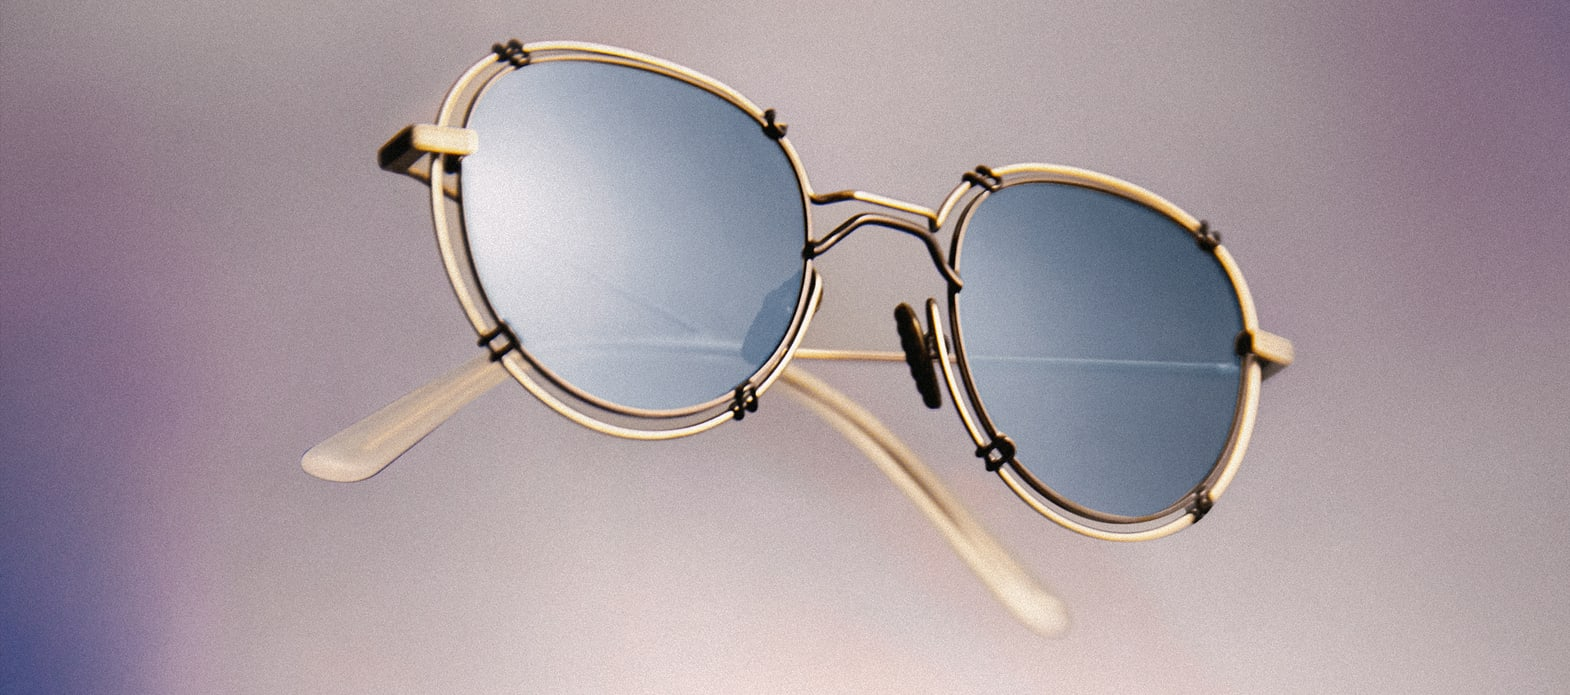 comprar online 8f8e9 807b6 Gafas de sol de moda - Multiópticas - MULTIÓPTICAS